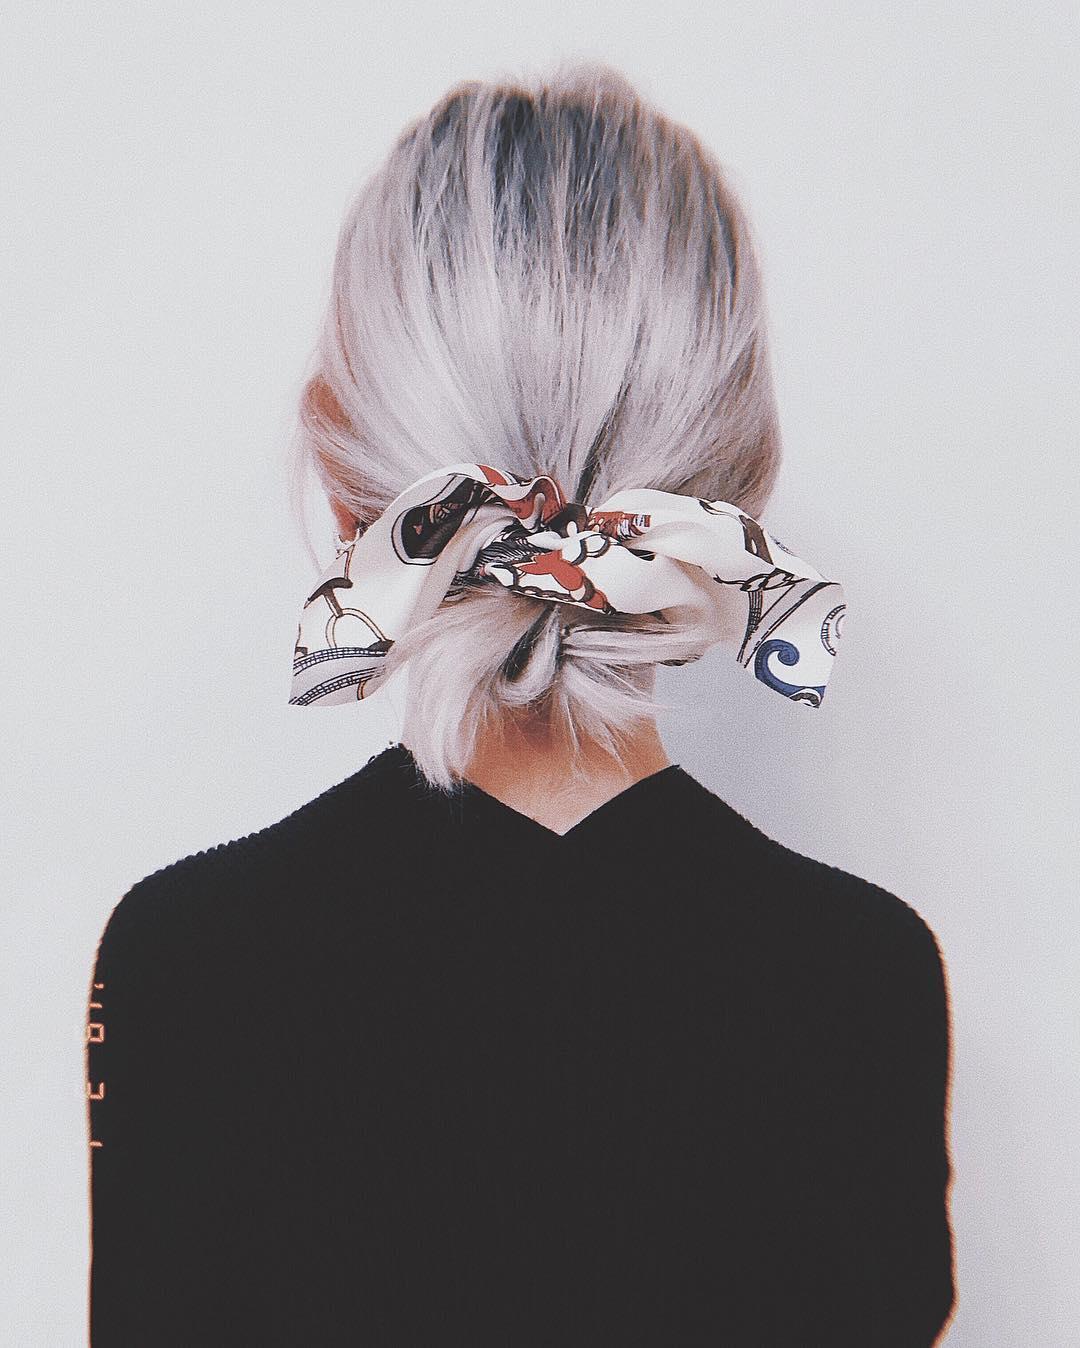 Fita-de-cabelo-multifuncional-Penteados-atuais-e-interessantes